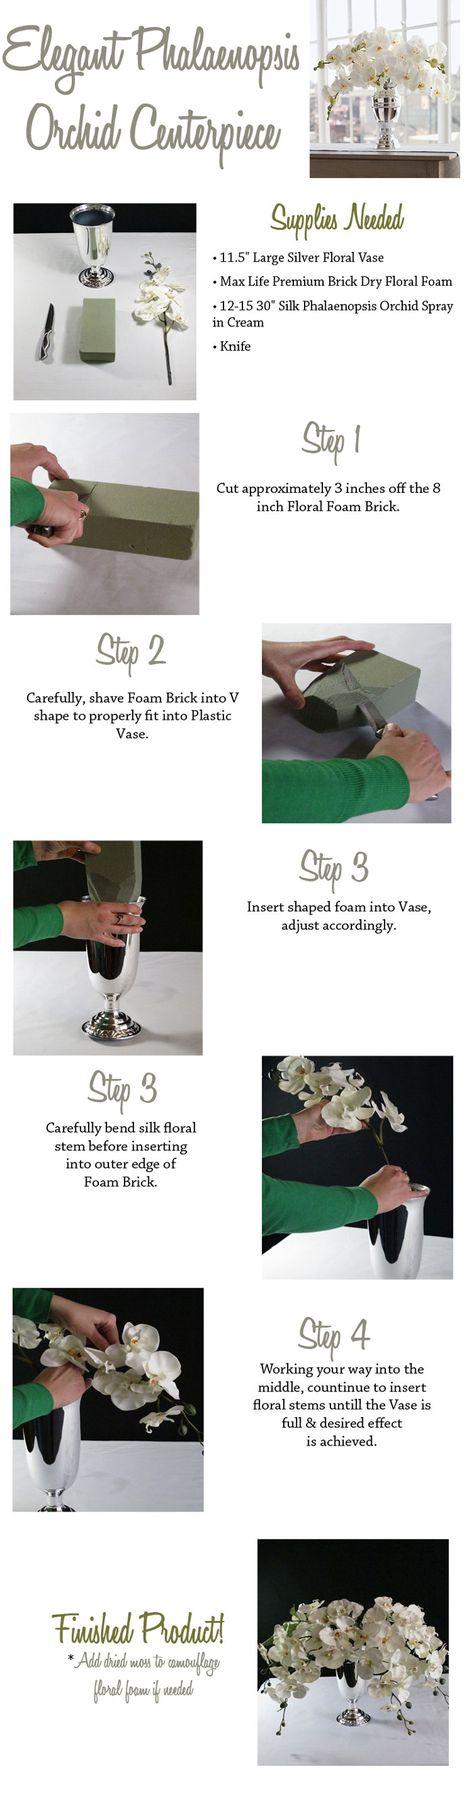 #diy wedding wedding flowers make your own phalaenopsis orchid centerpiece shop wedding flowers and wedding decorations www.afloral.com